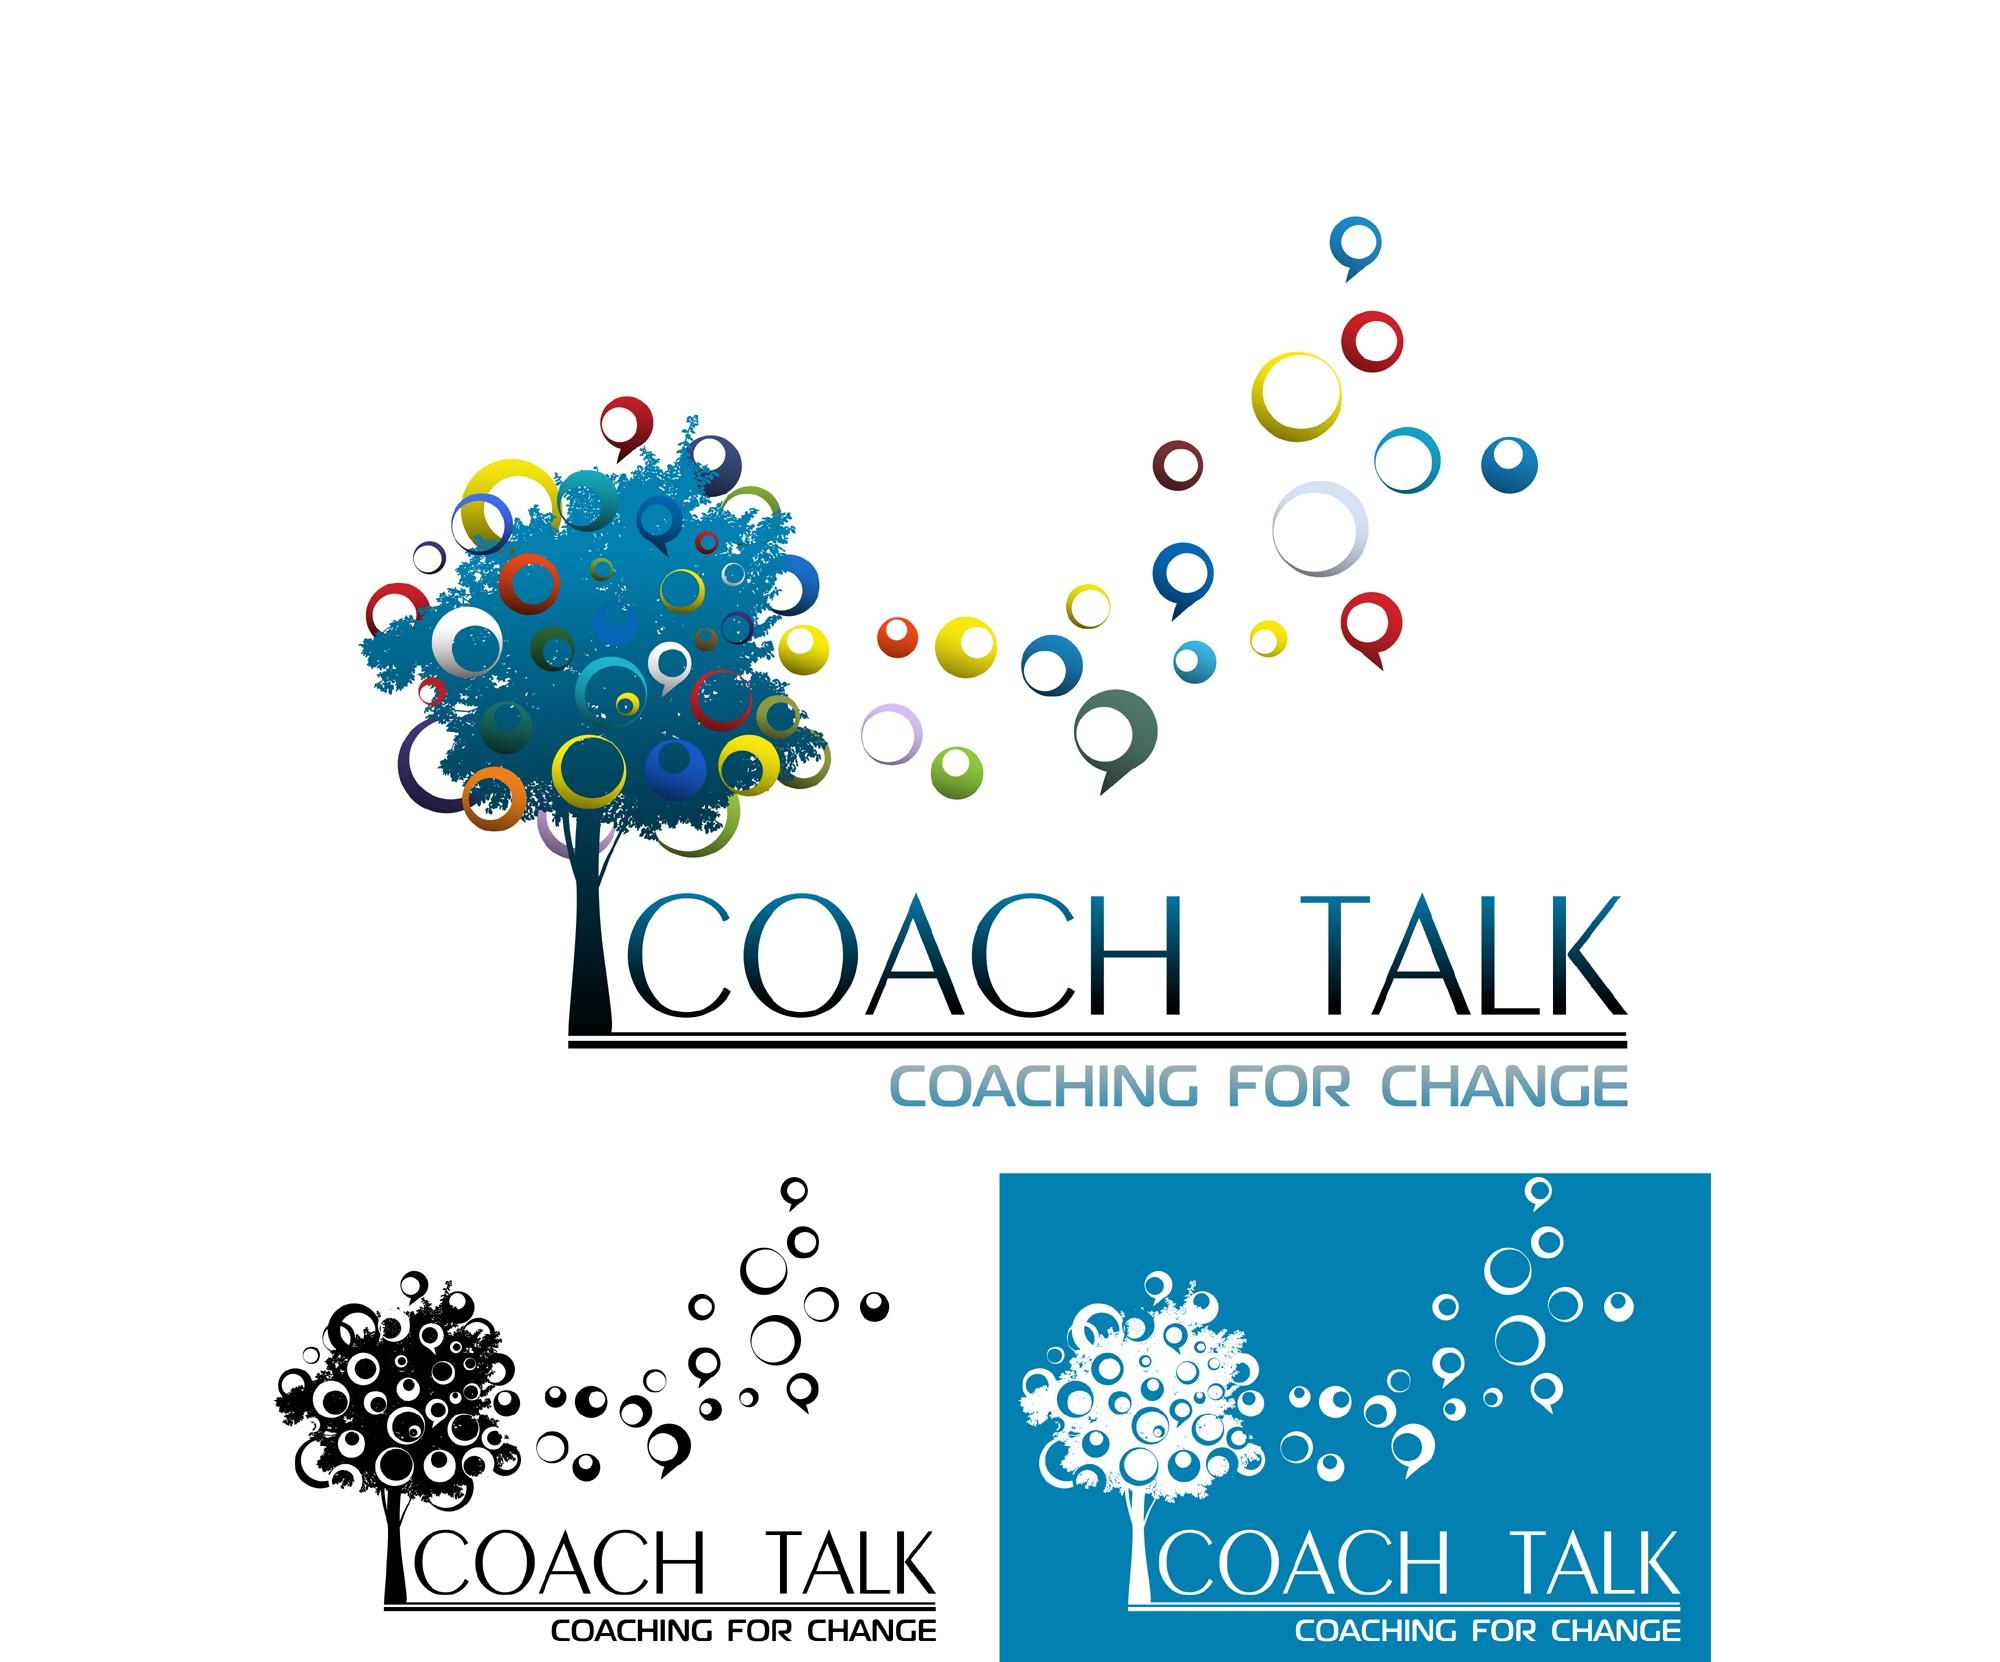 Help Coach Talk with a new logo